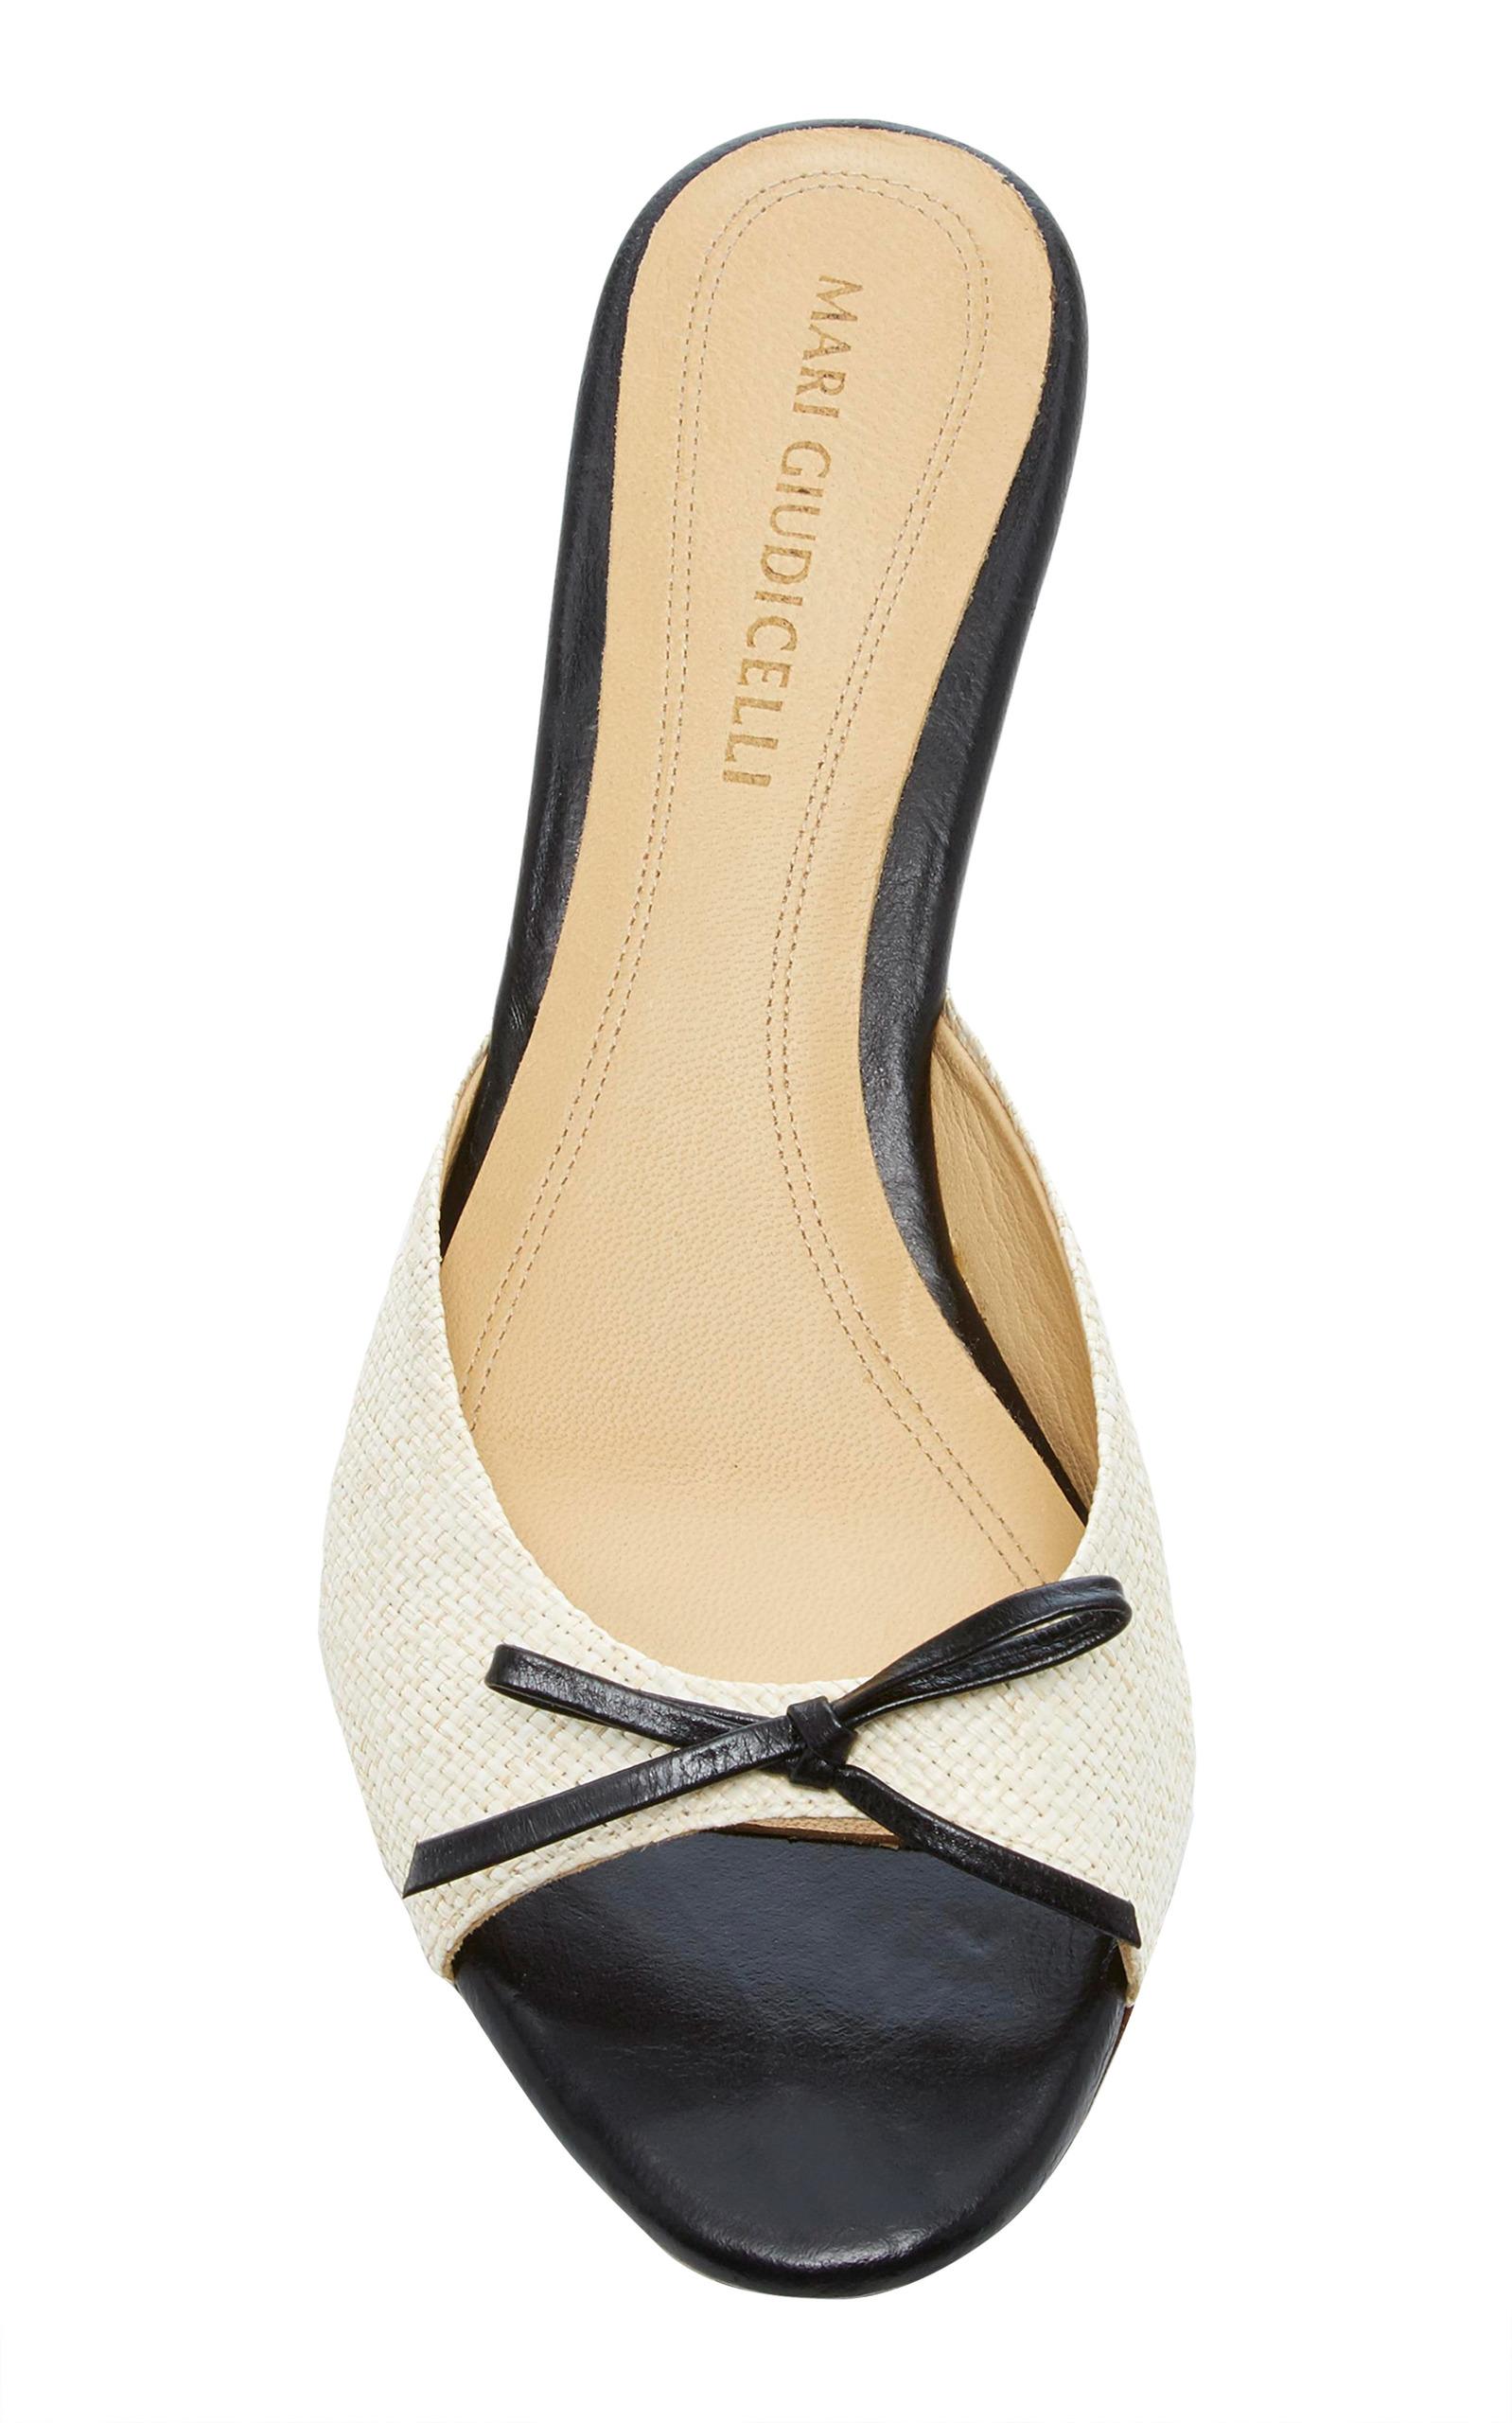 Sandale Jeanne Sandale Jeanne Jeanne Mari Giudicelli Giudicelli Giudicelli Sandale Mari Jeanne Mari Sandale Mari Giudicelli Mari Z1wznqf